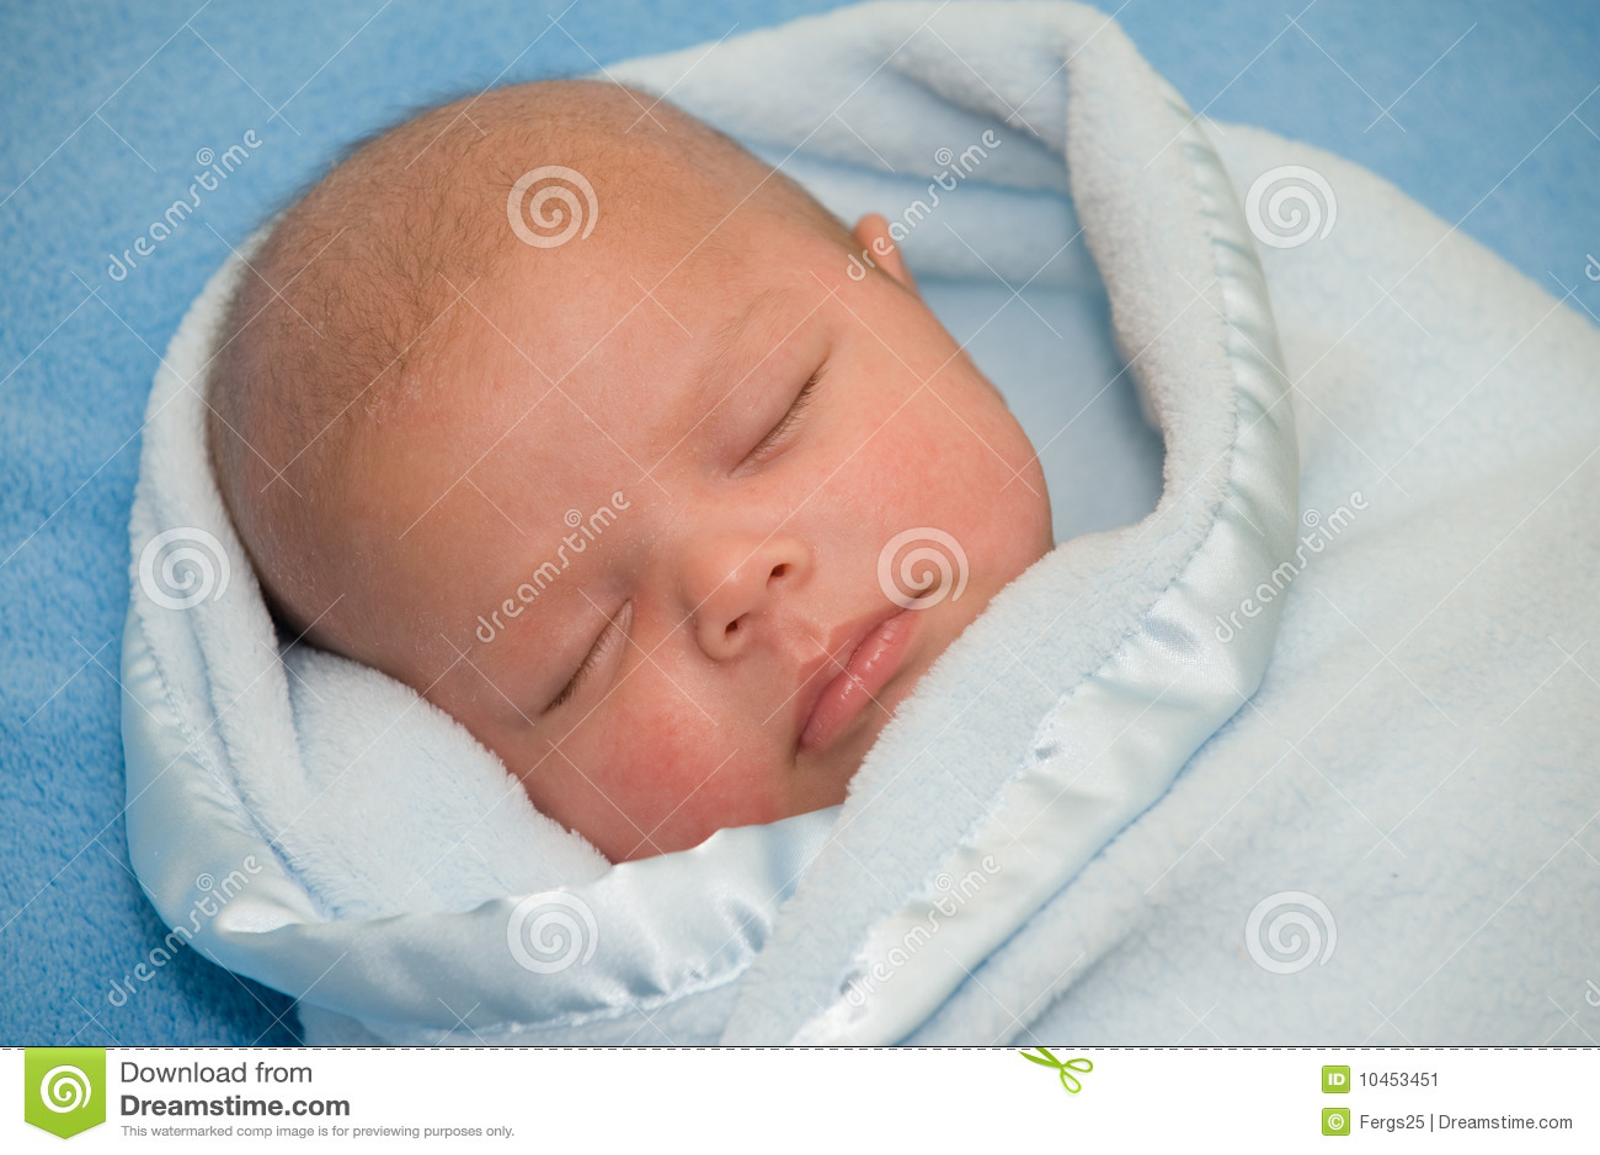 Newborn Baby Boy Stock Image - Image: 10453451